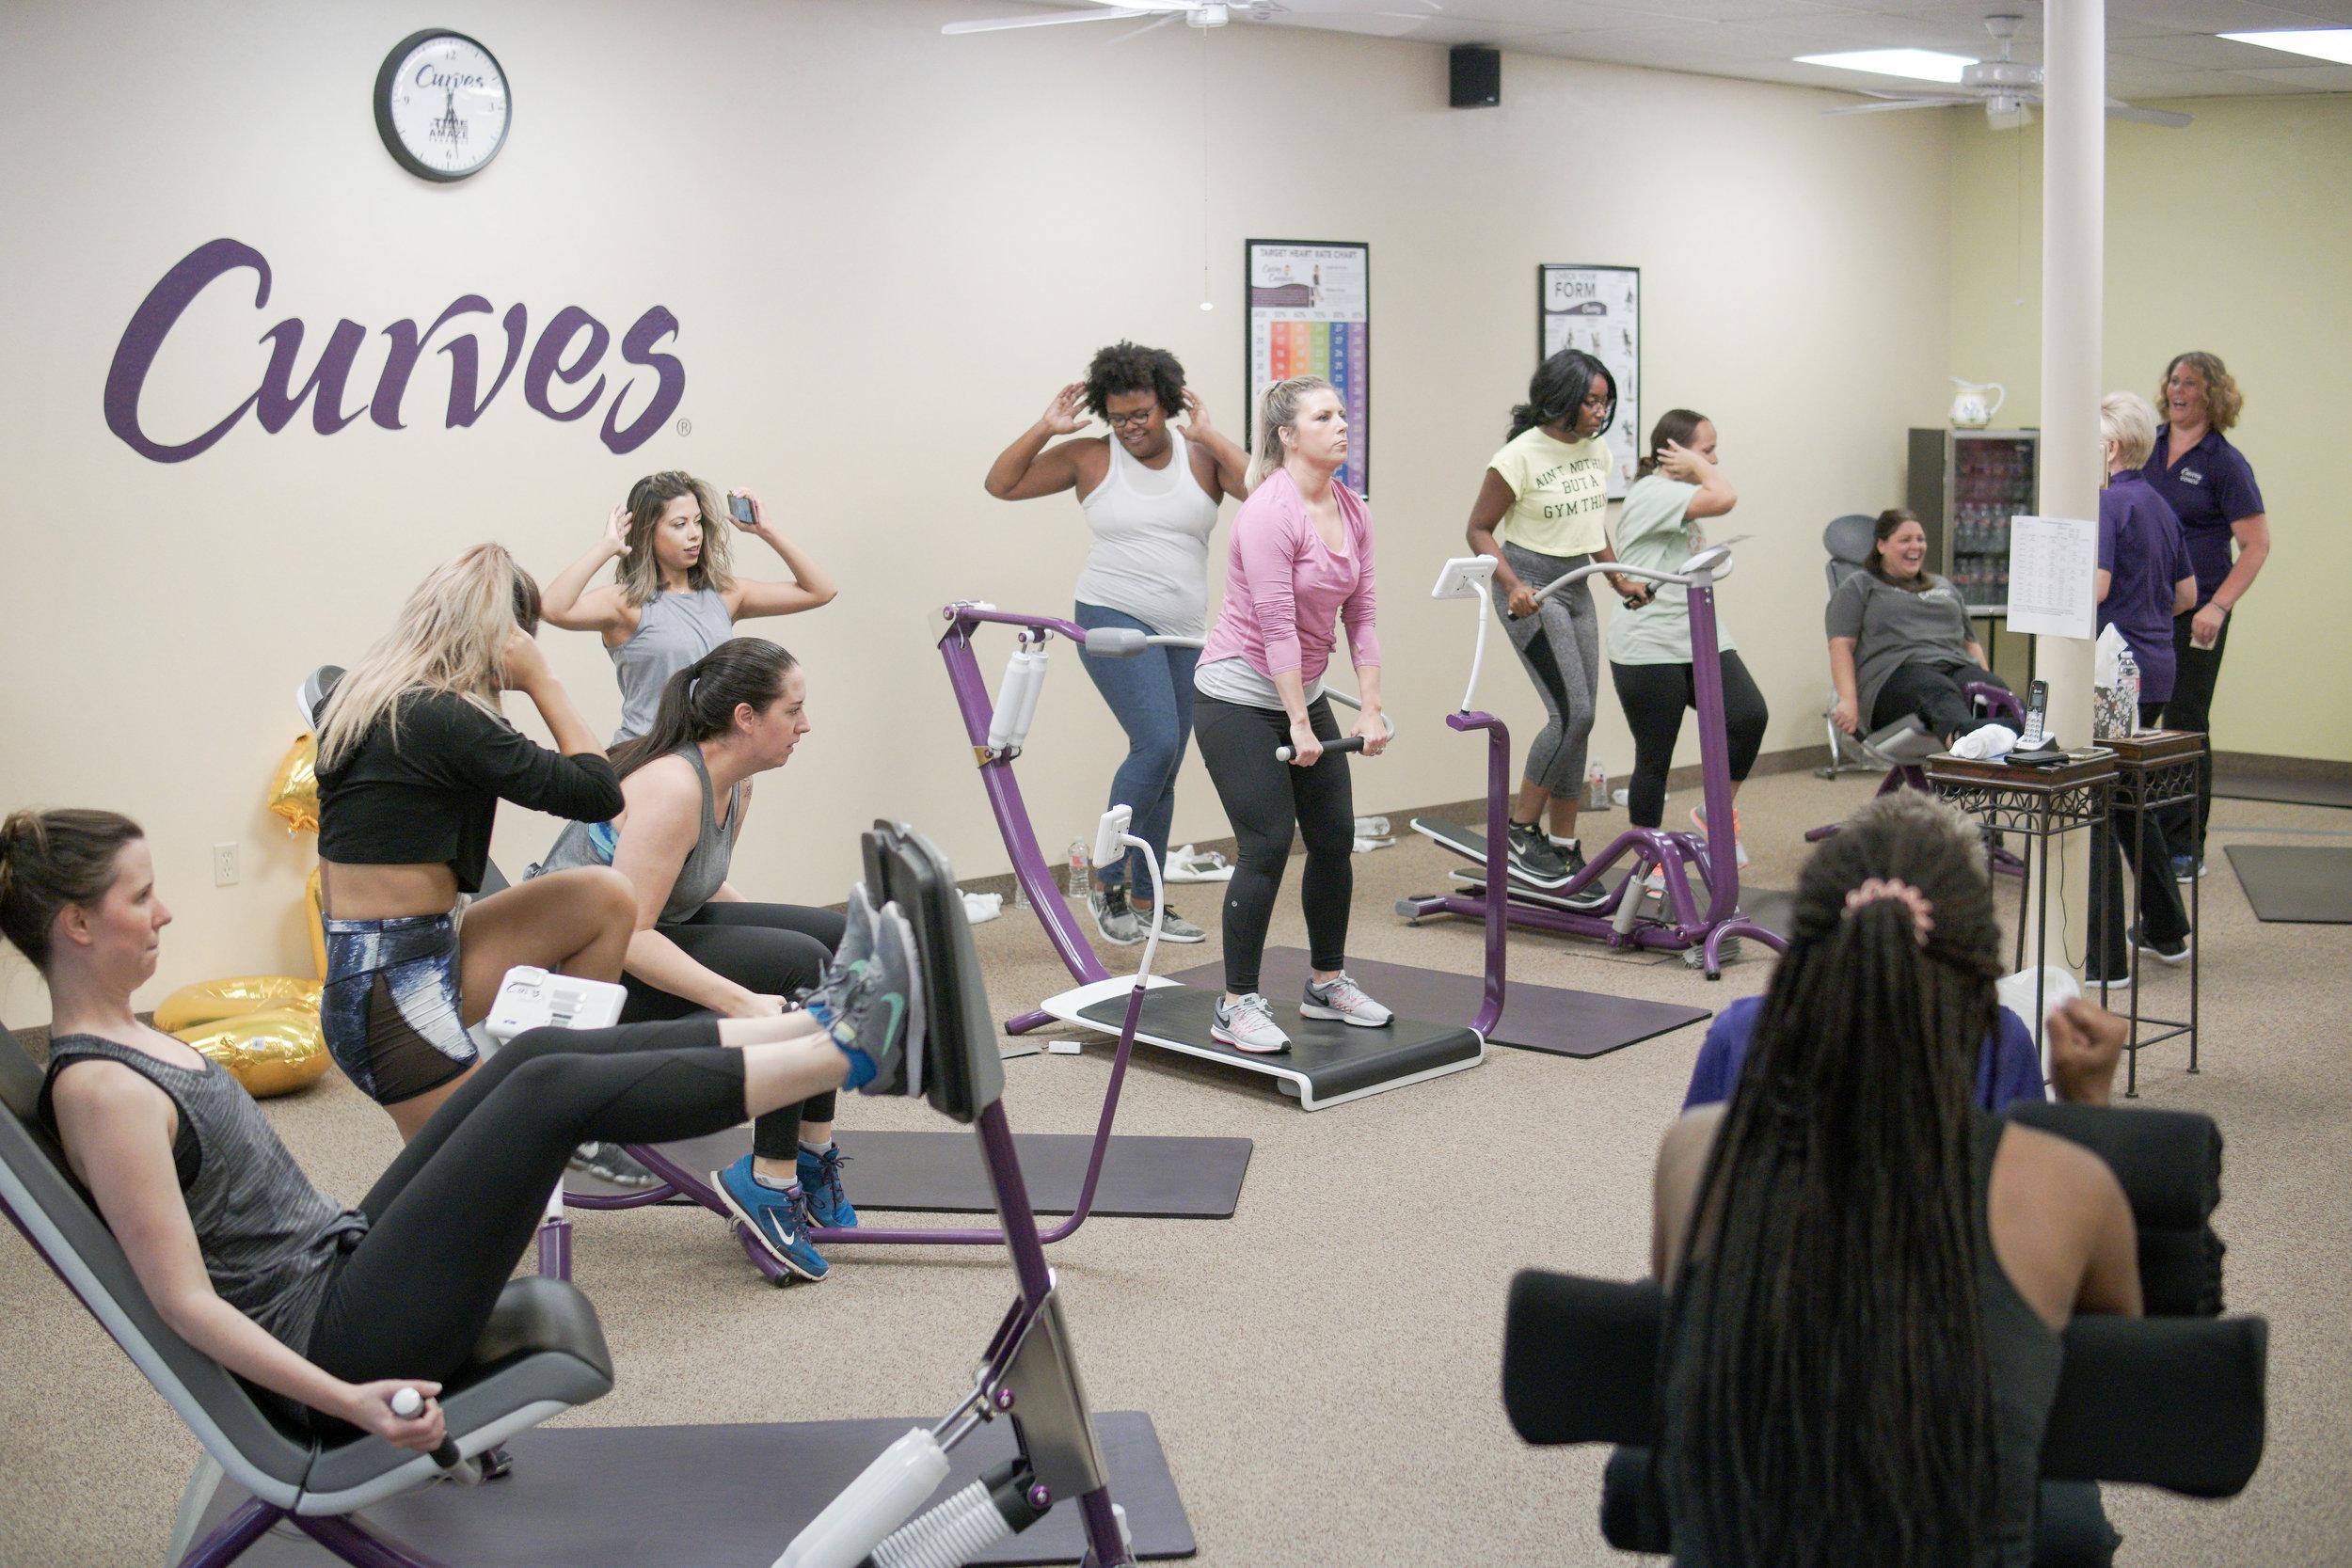 curves-circuit-workout-strength-training-setup